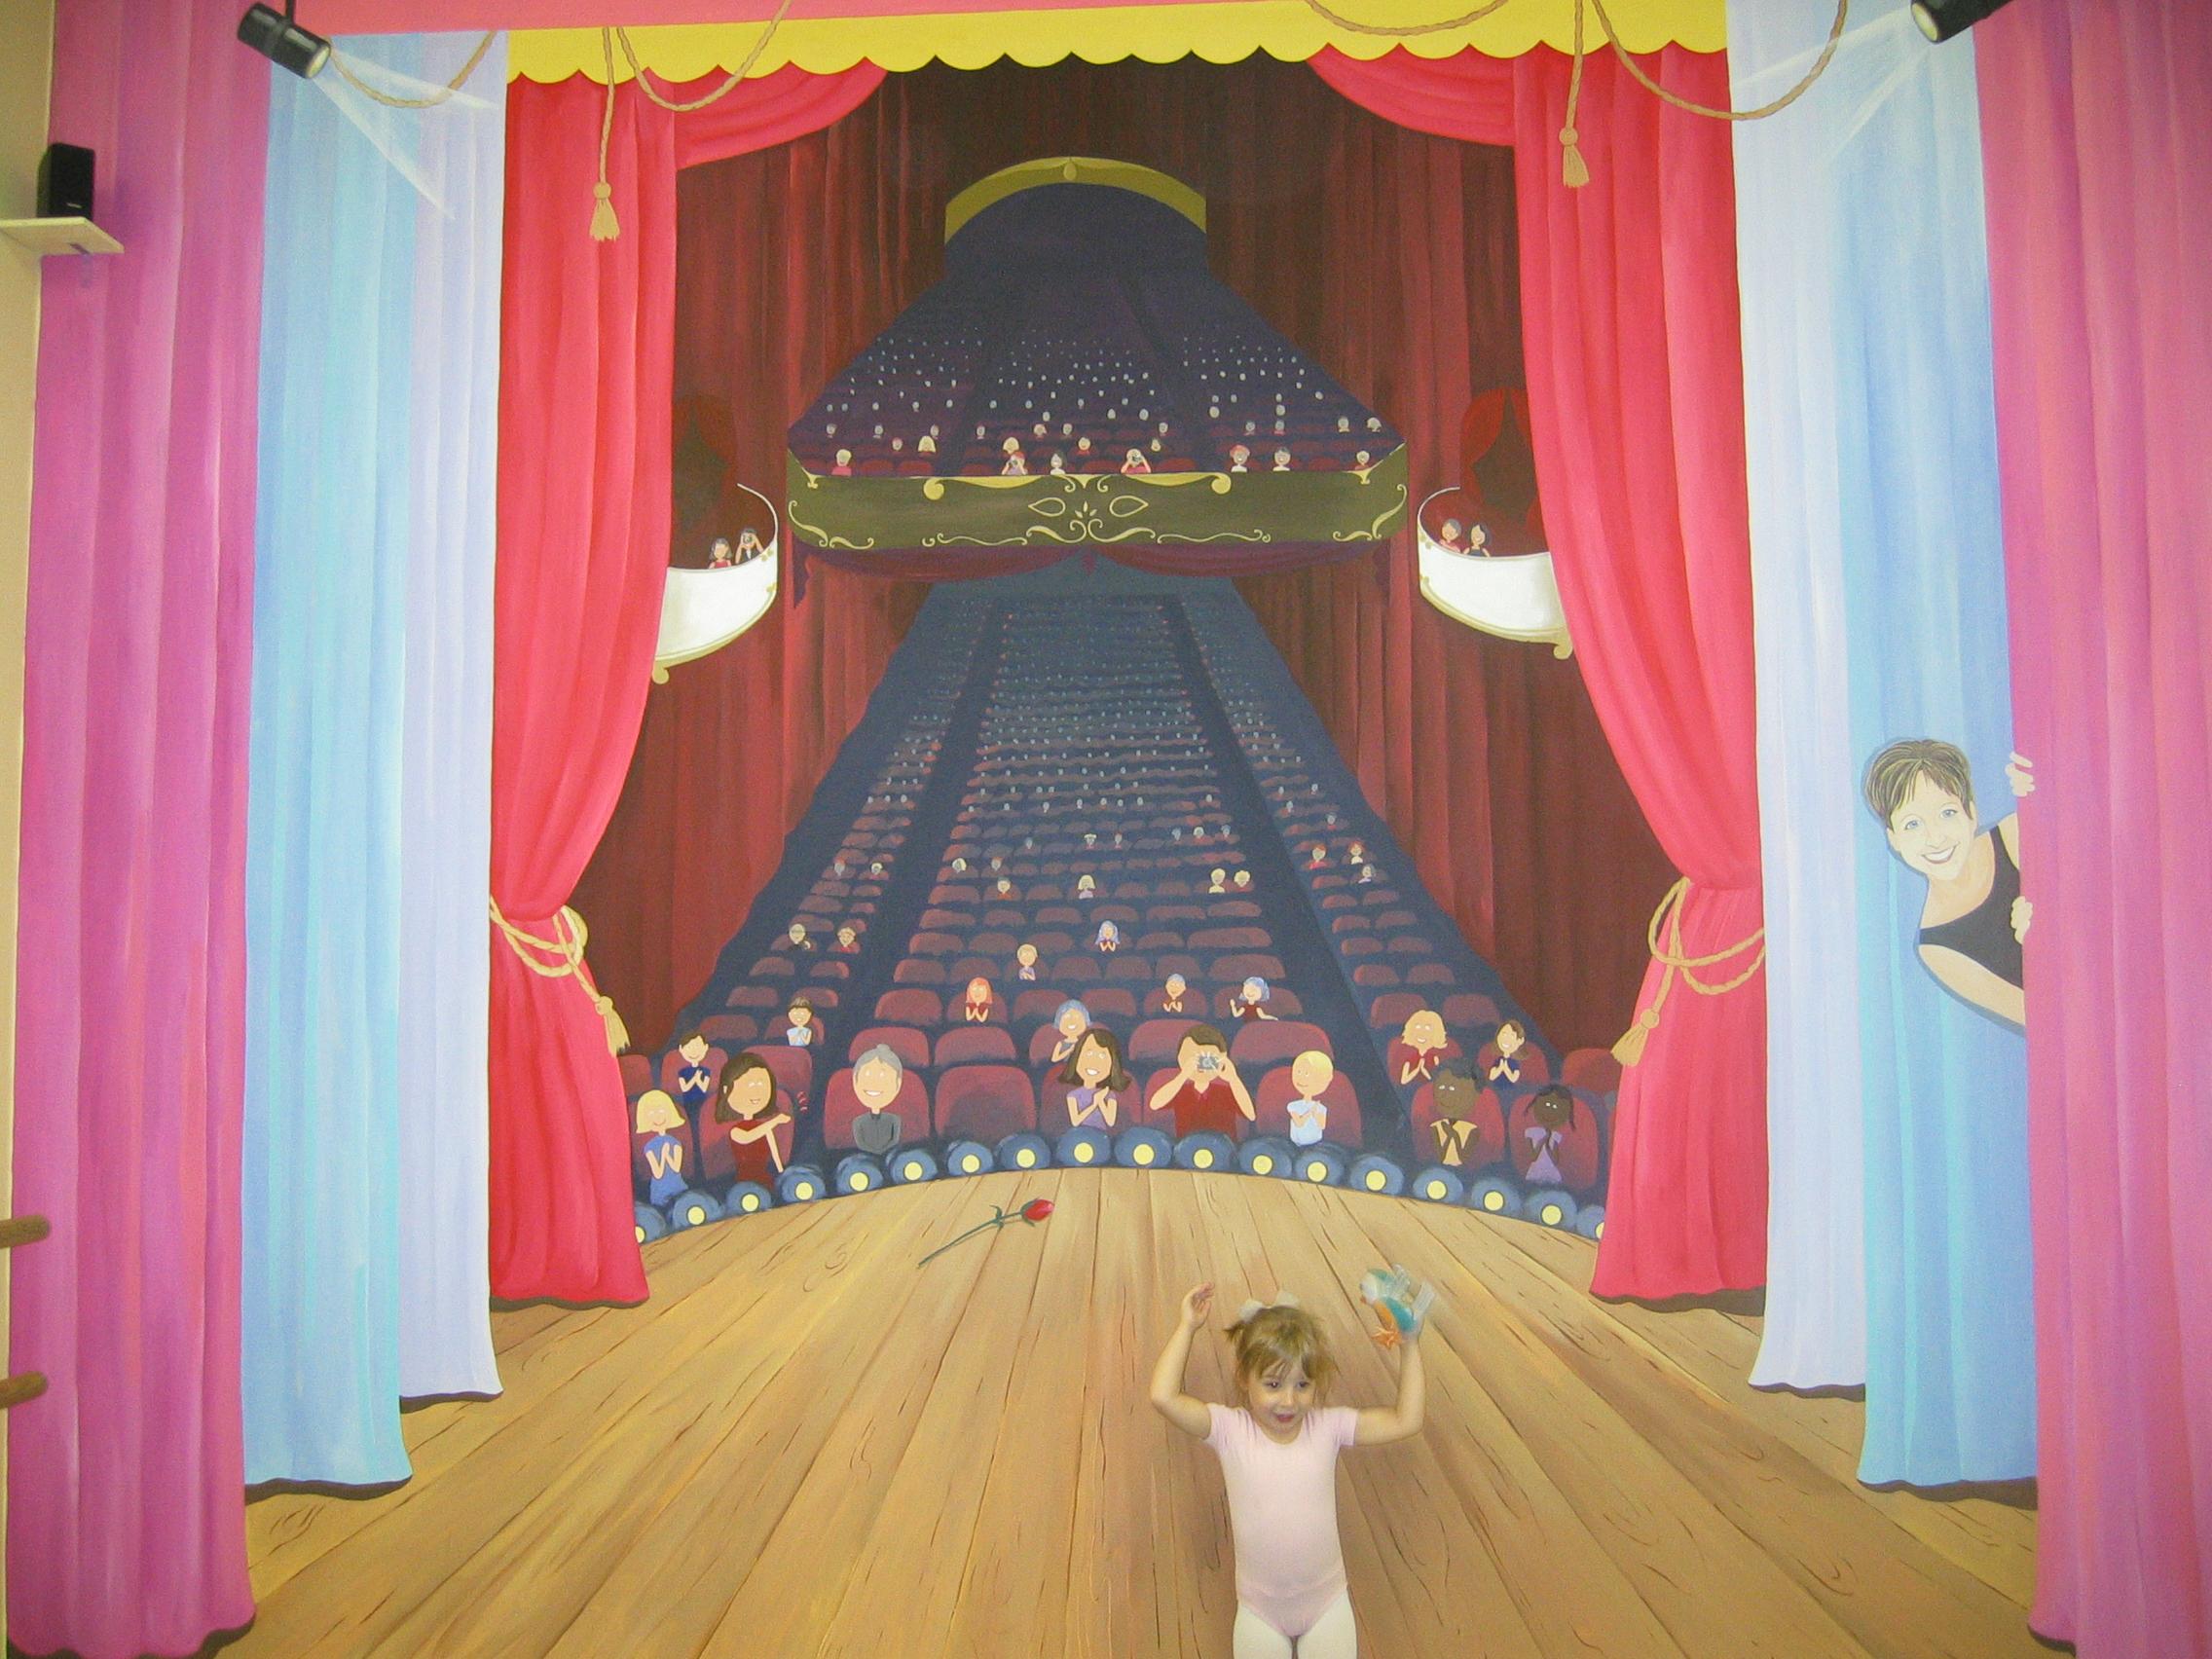 20031023.06.allen.mural.ballet.JPG